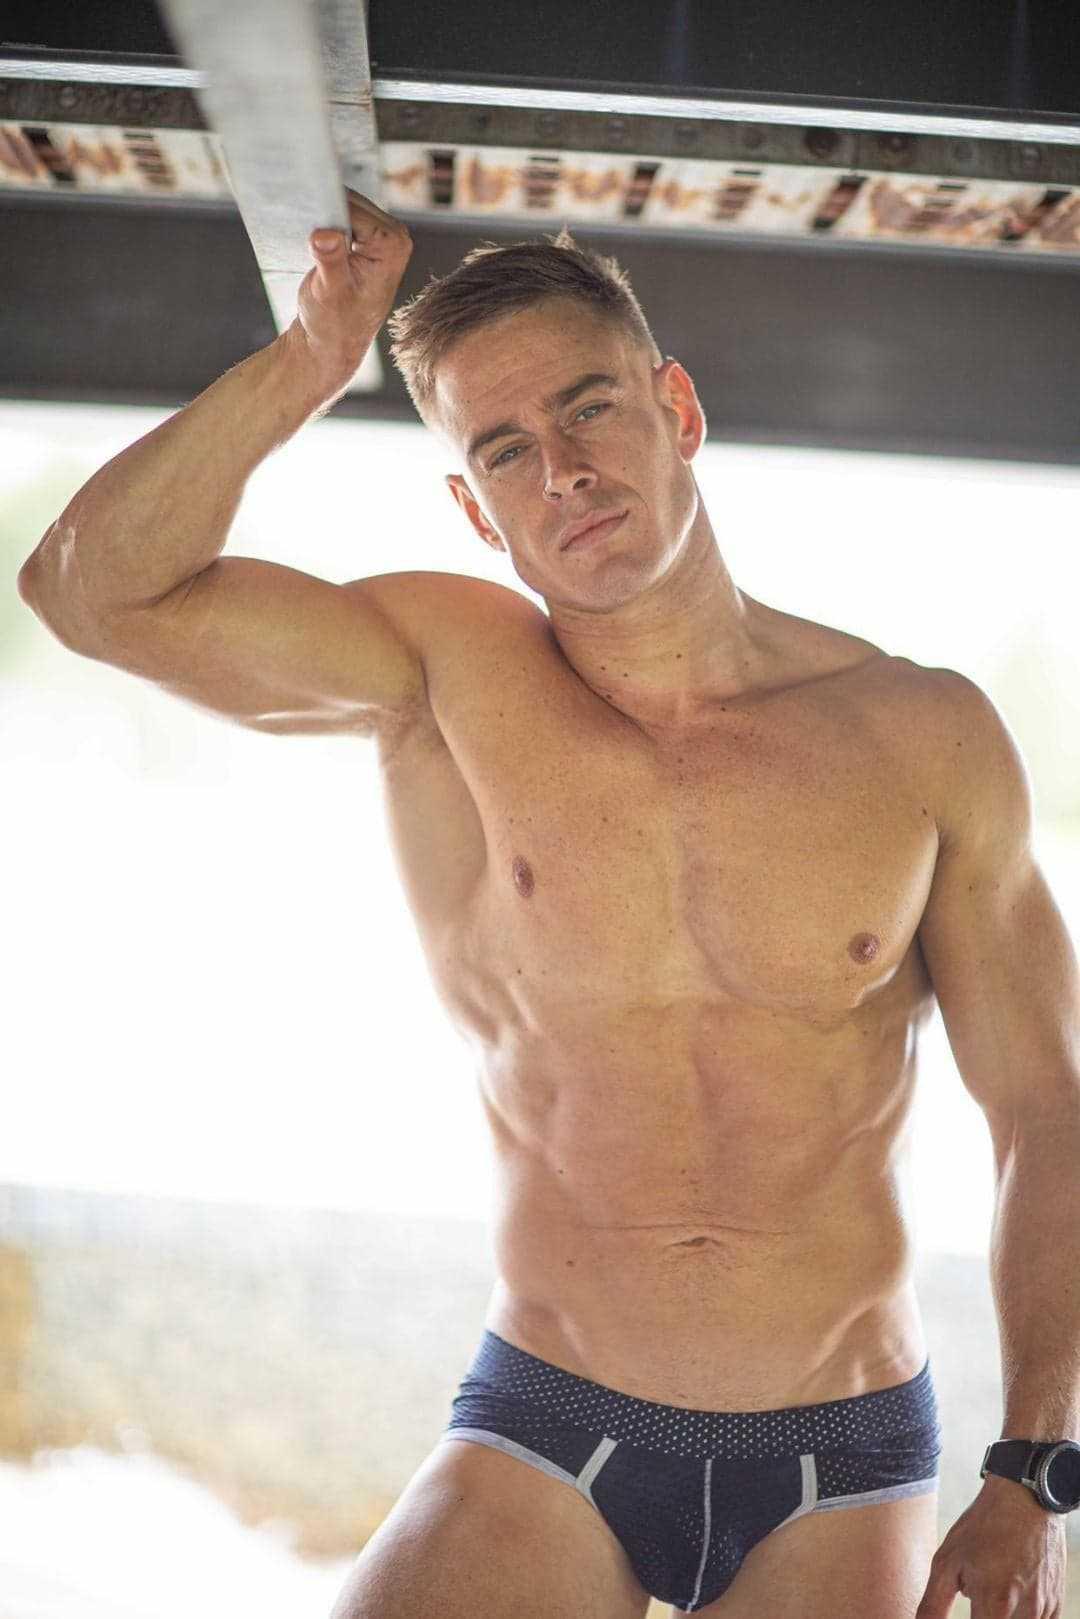 Andrew-male-stripper-Magic-Men